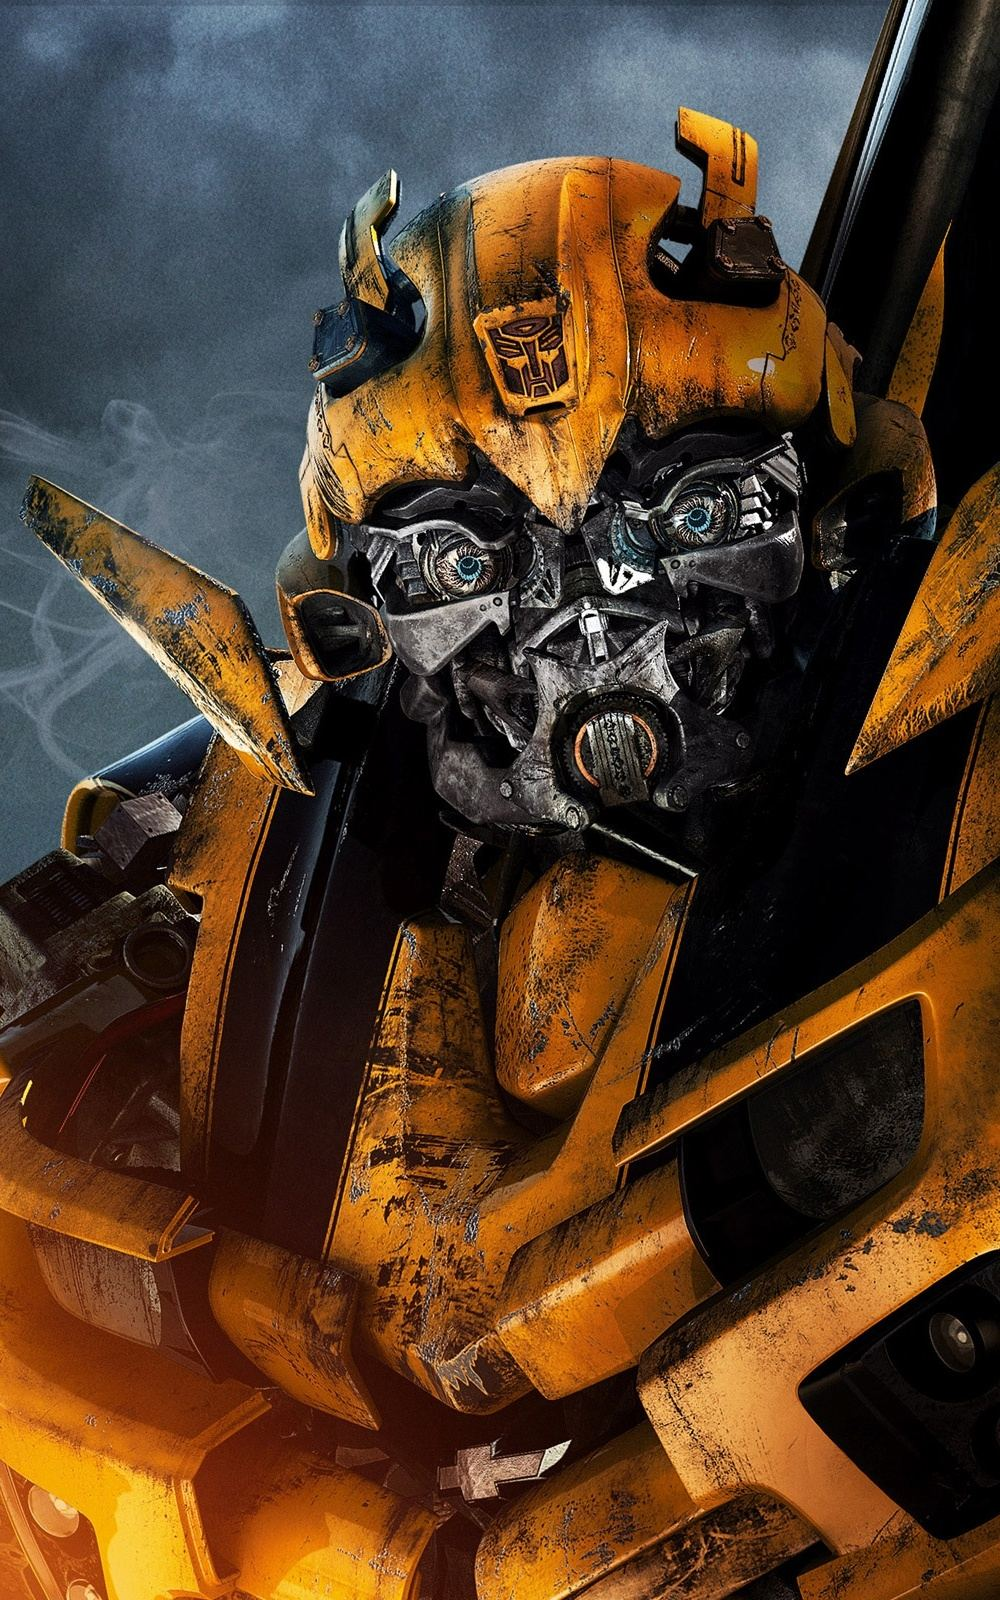 Bumblebee Transformers Lockscreen iPhone 6 Plus HD Wallpaper